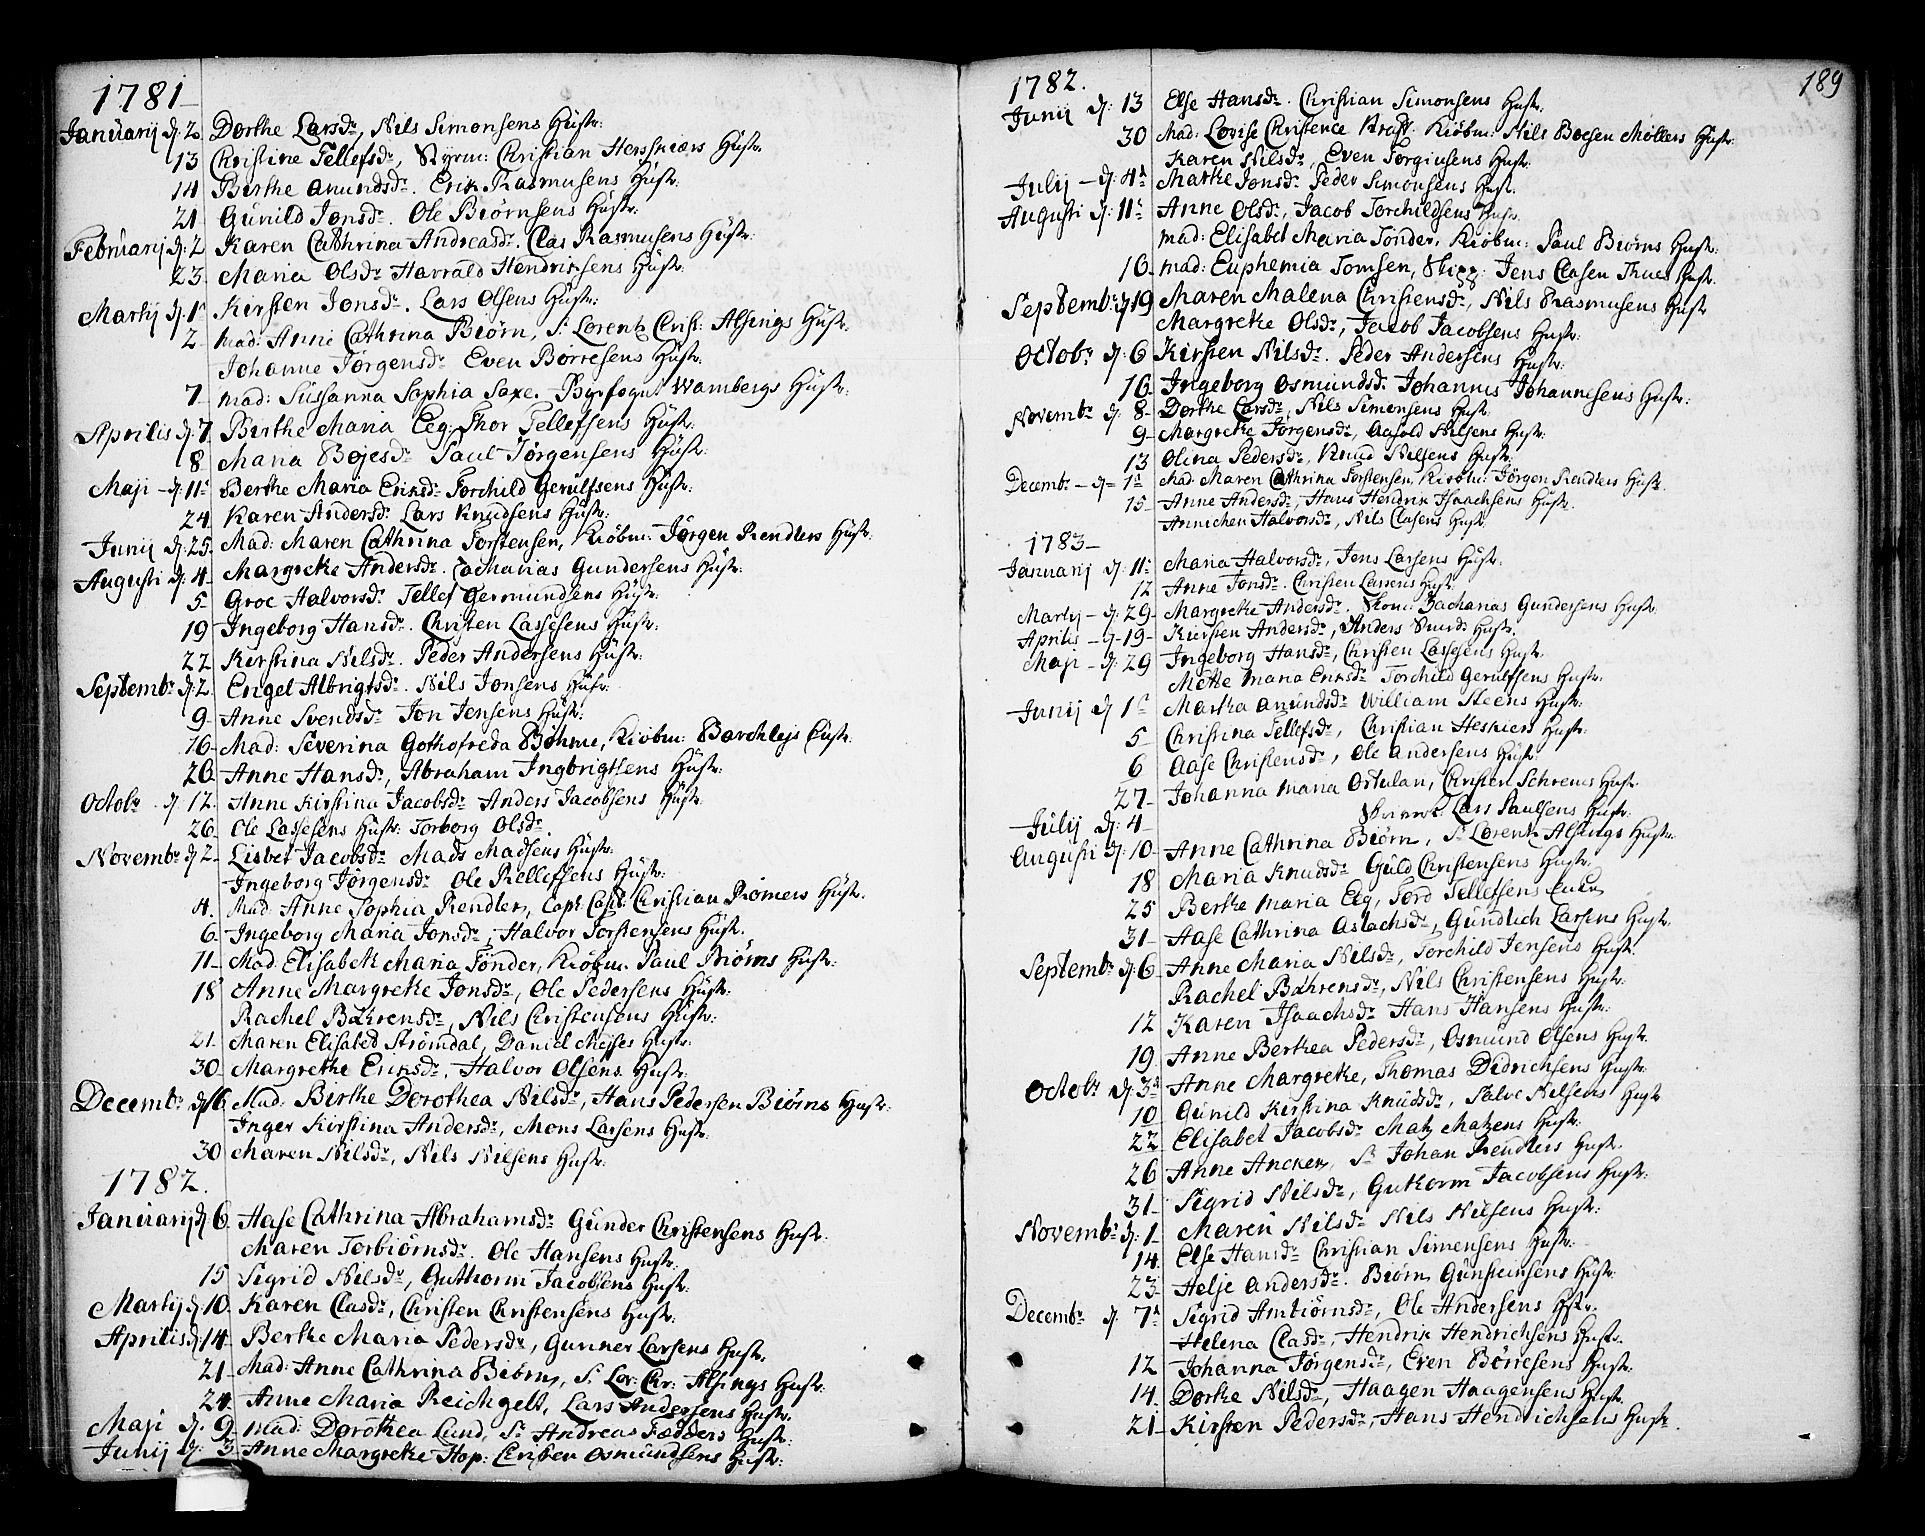 SAKO, Kragerø kirkebøker, F/Fa/L0002: Ministerialbok nr. 2, 1767-1802, s. 189